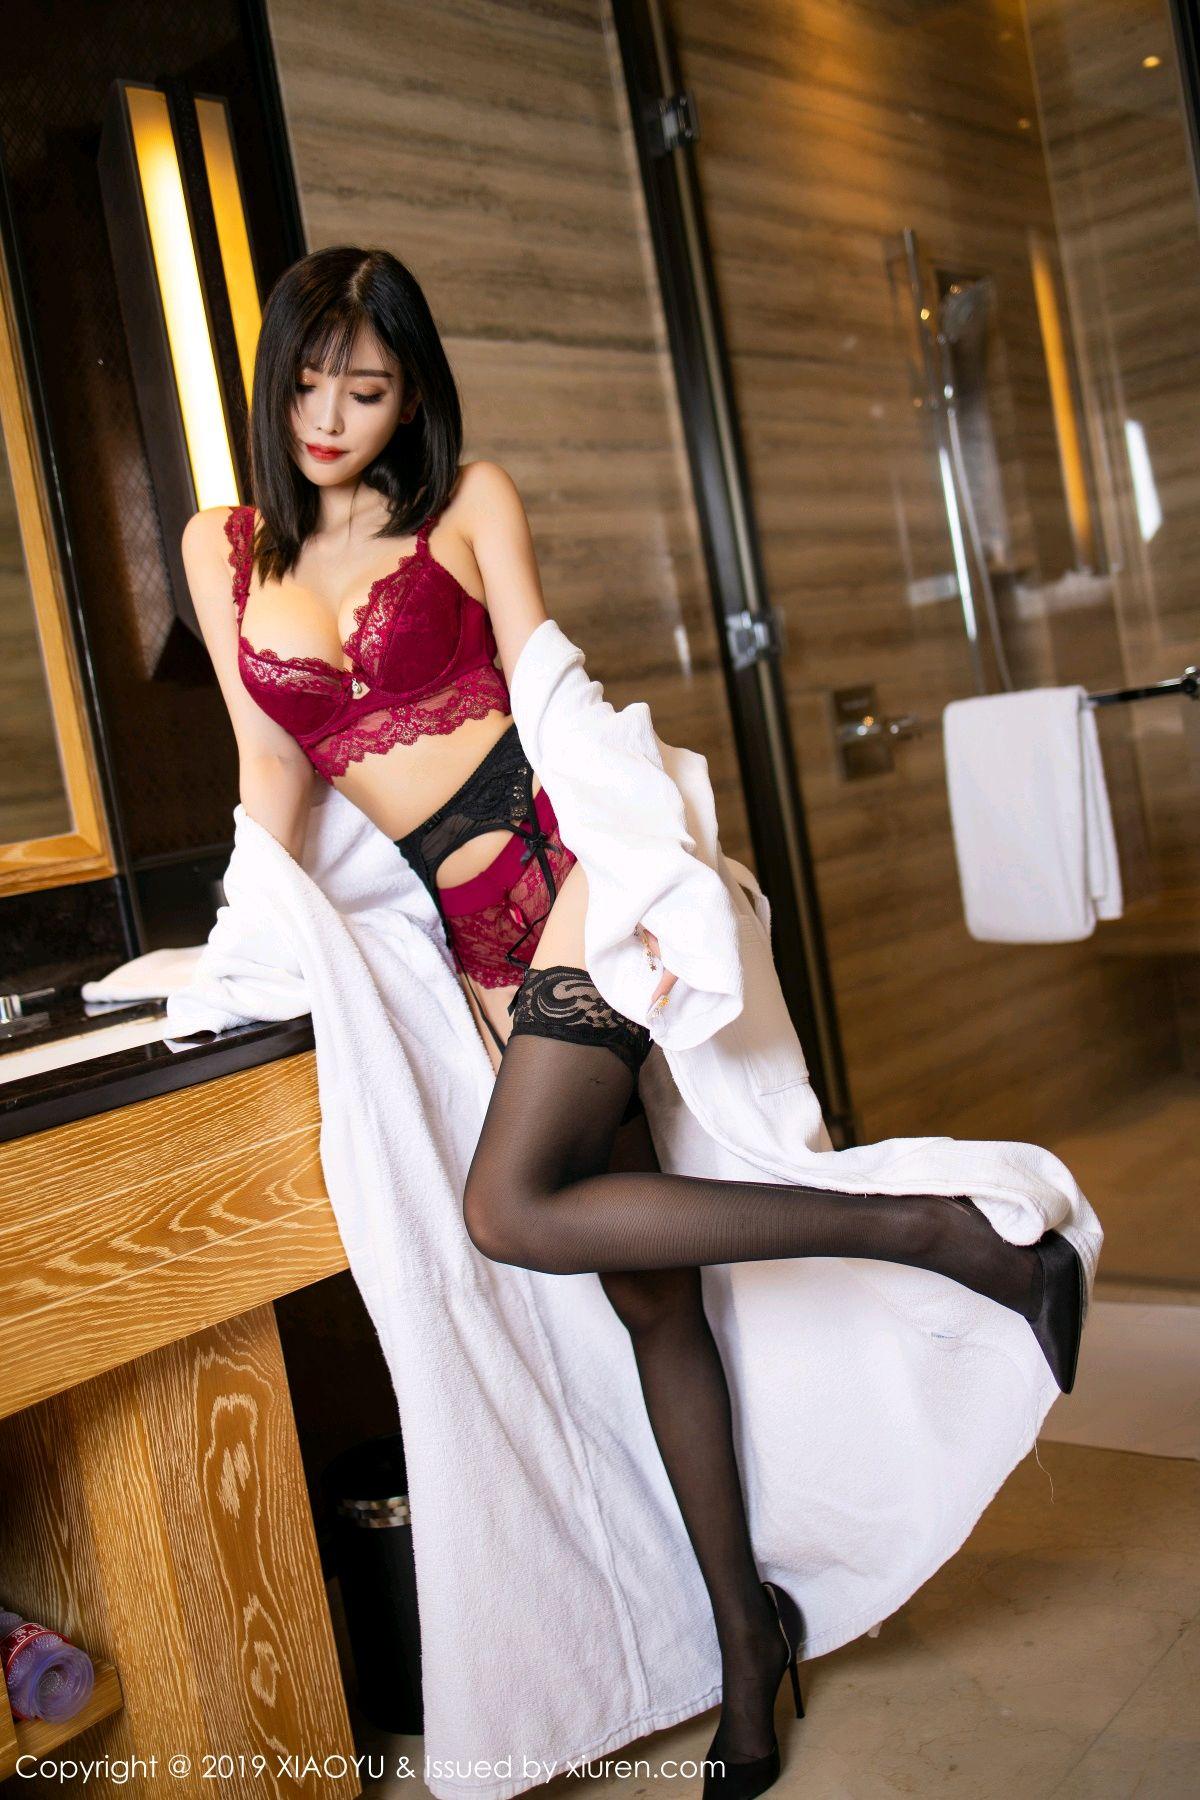 [XiaoYu] Vol.153 Yang Chen Chen 33P, Bathroom, Black Silk, Underwear, XiaoYu, Yang Chen Chen